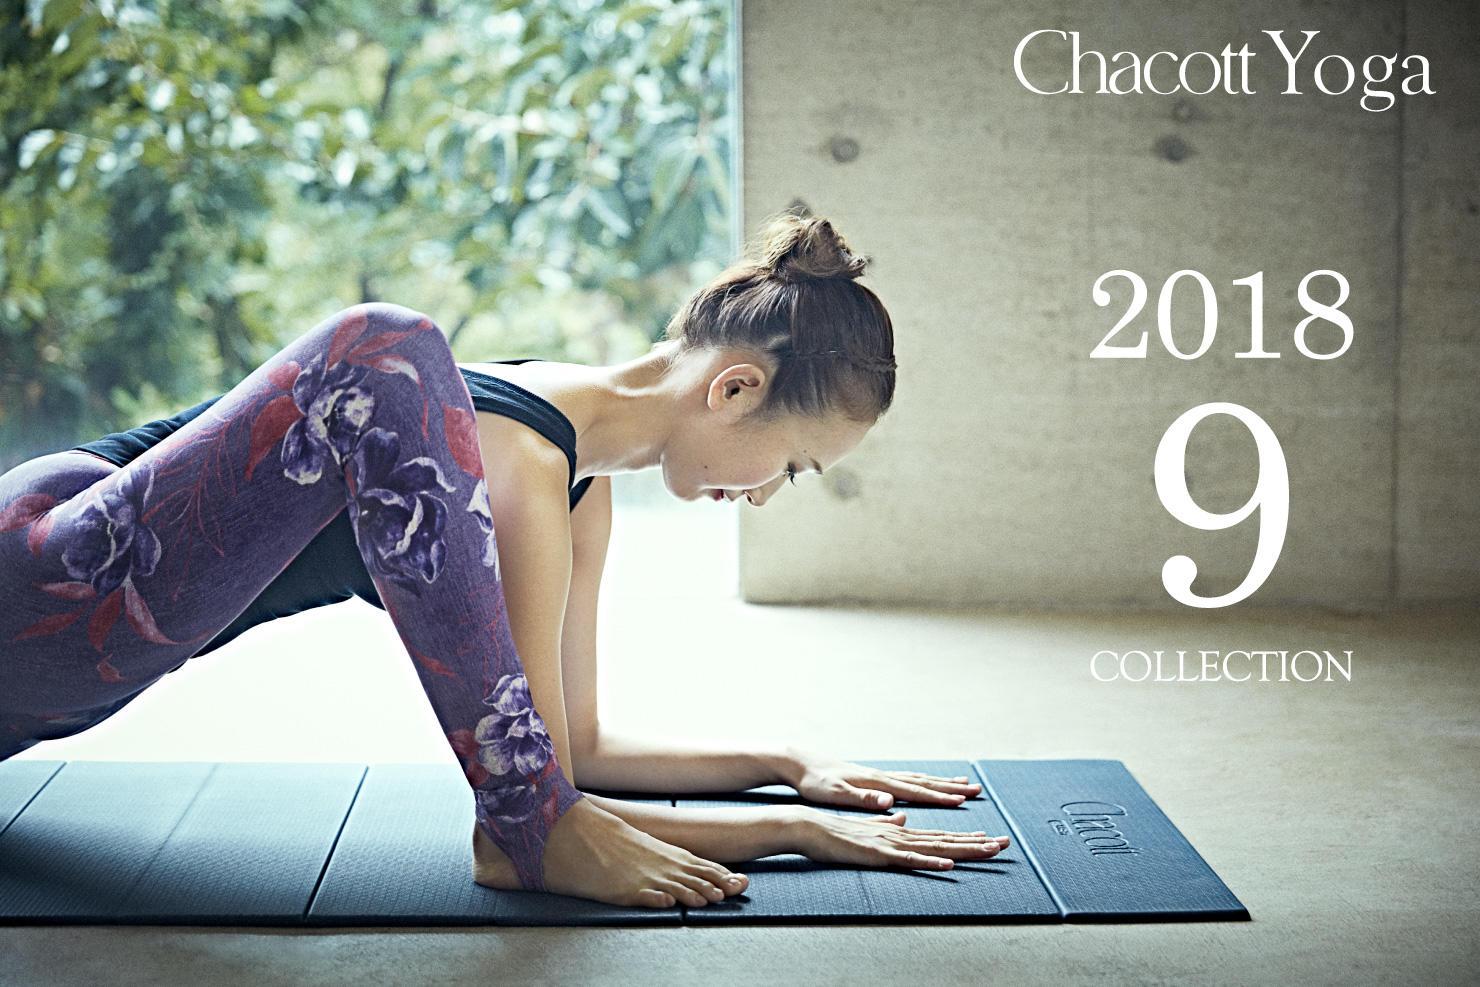 chacott_yoga_title_sep.jpg